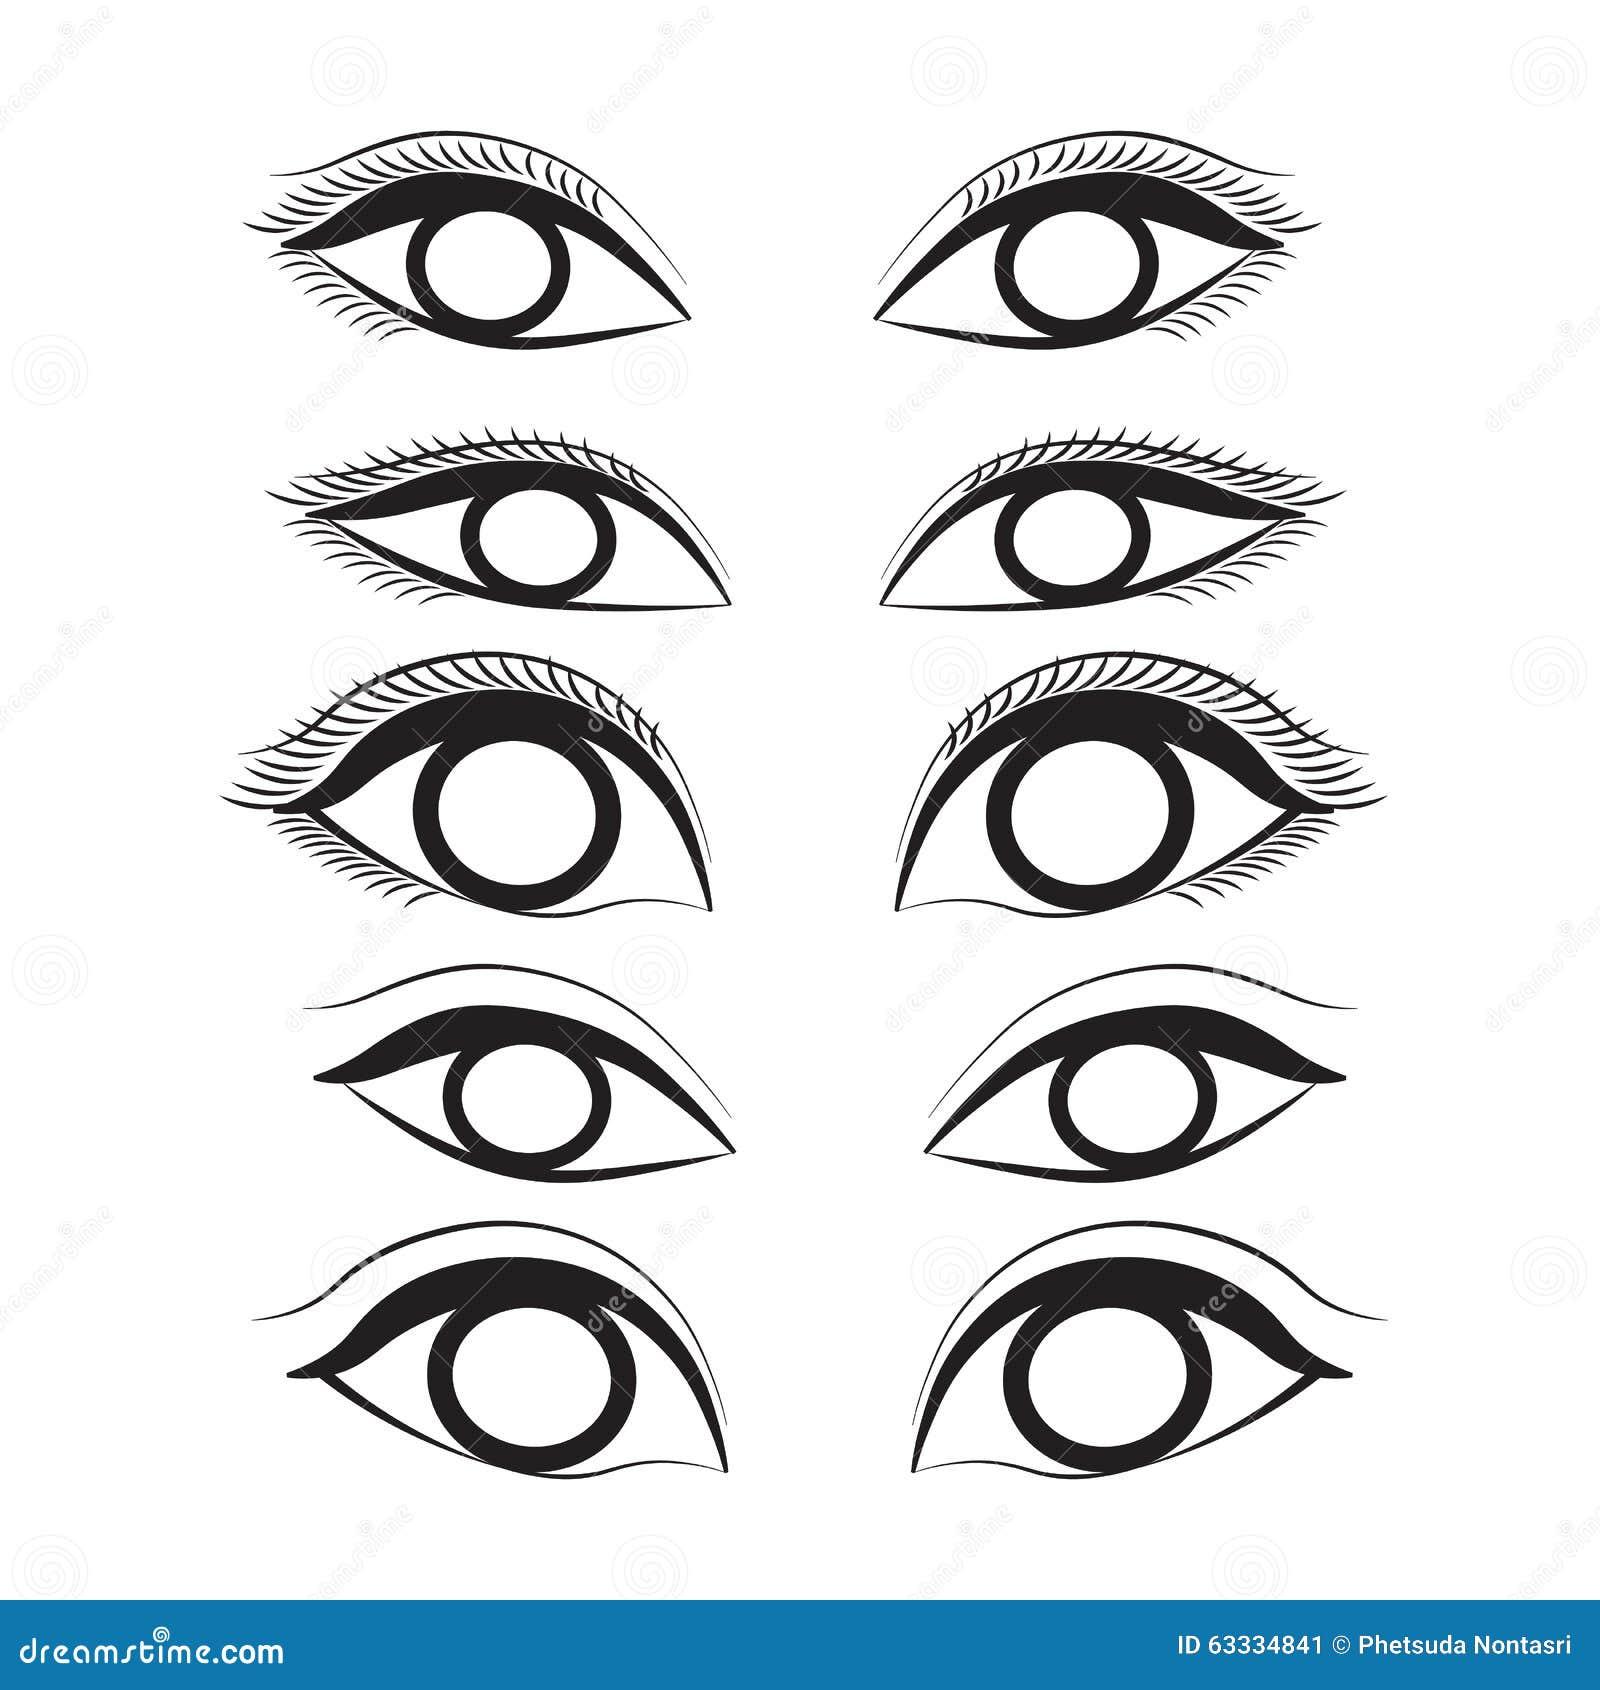 Eye Cartoon Line Sketch Shape Design Abstract Illustration Stock Image 63334841